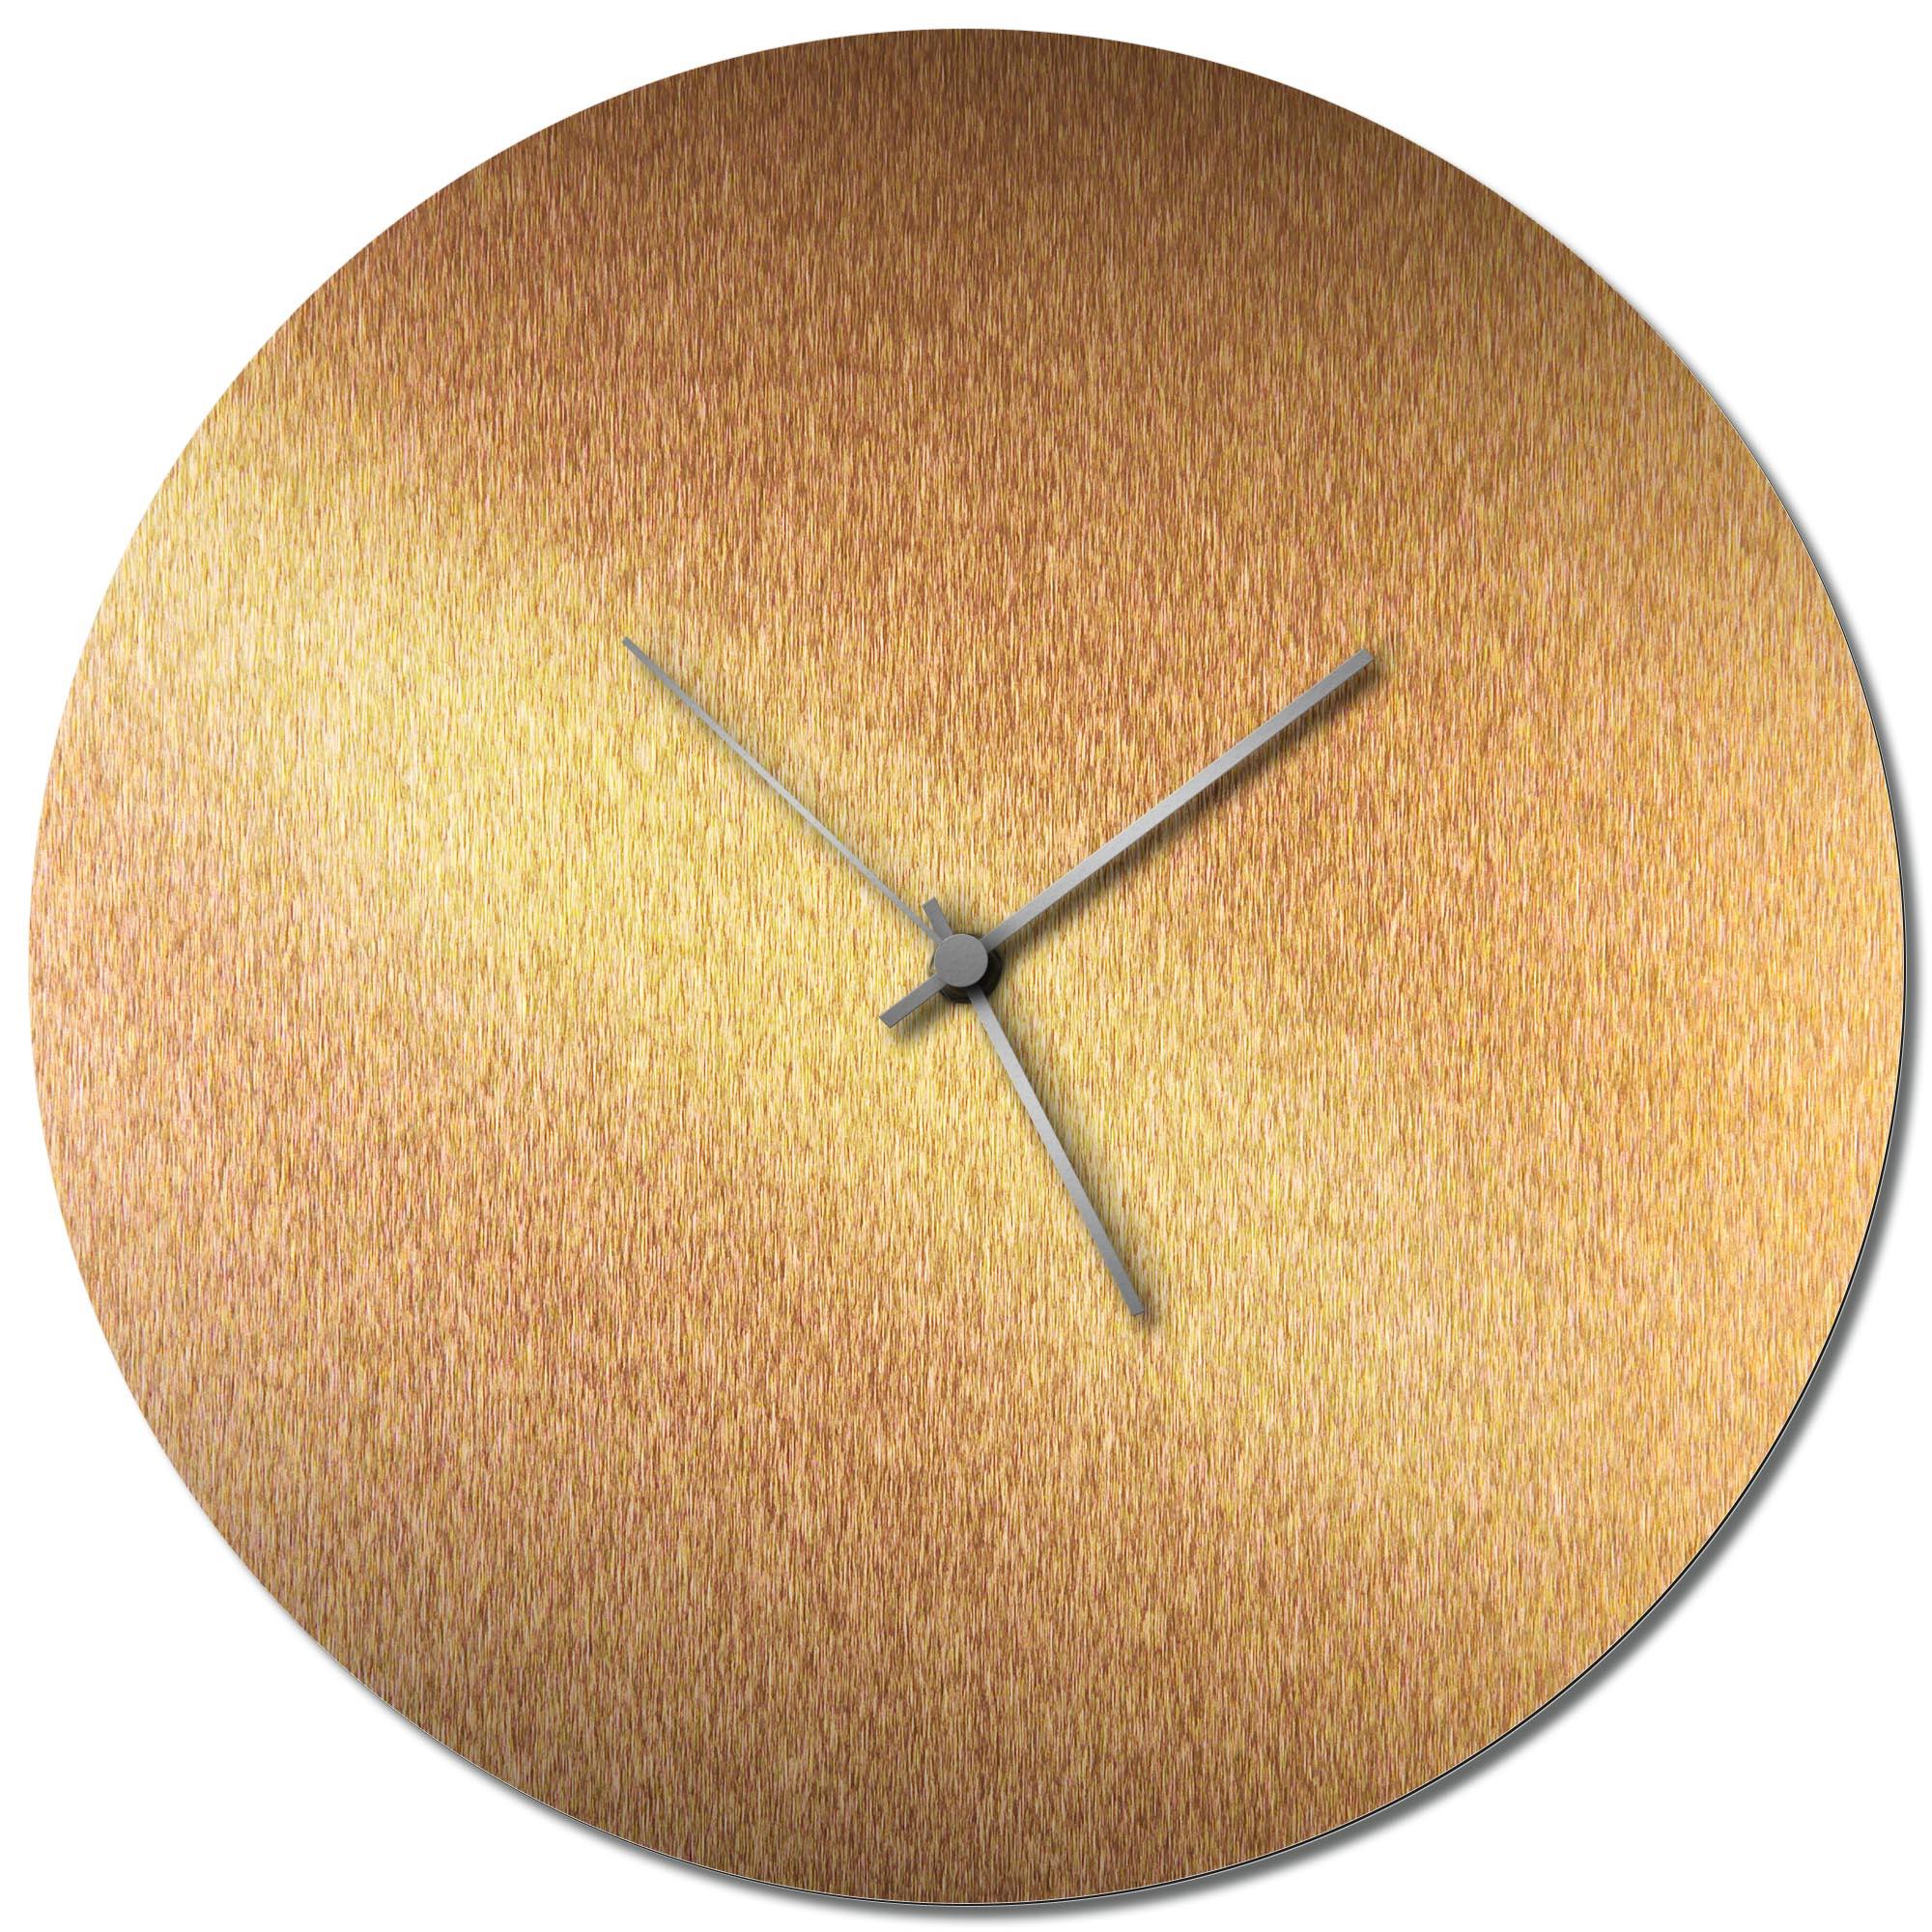 Adam Schwoeppe 'Bronzesmith Circle Clock Silver' Midcentury Modern Style Wall Clock